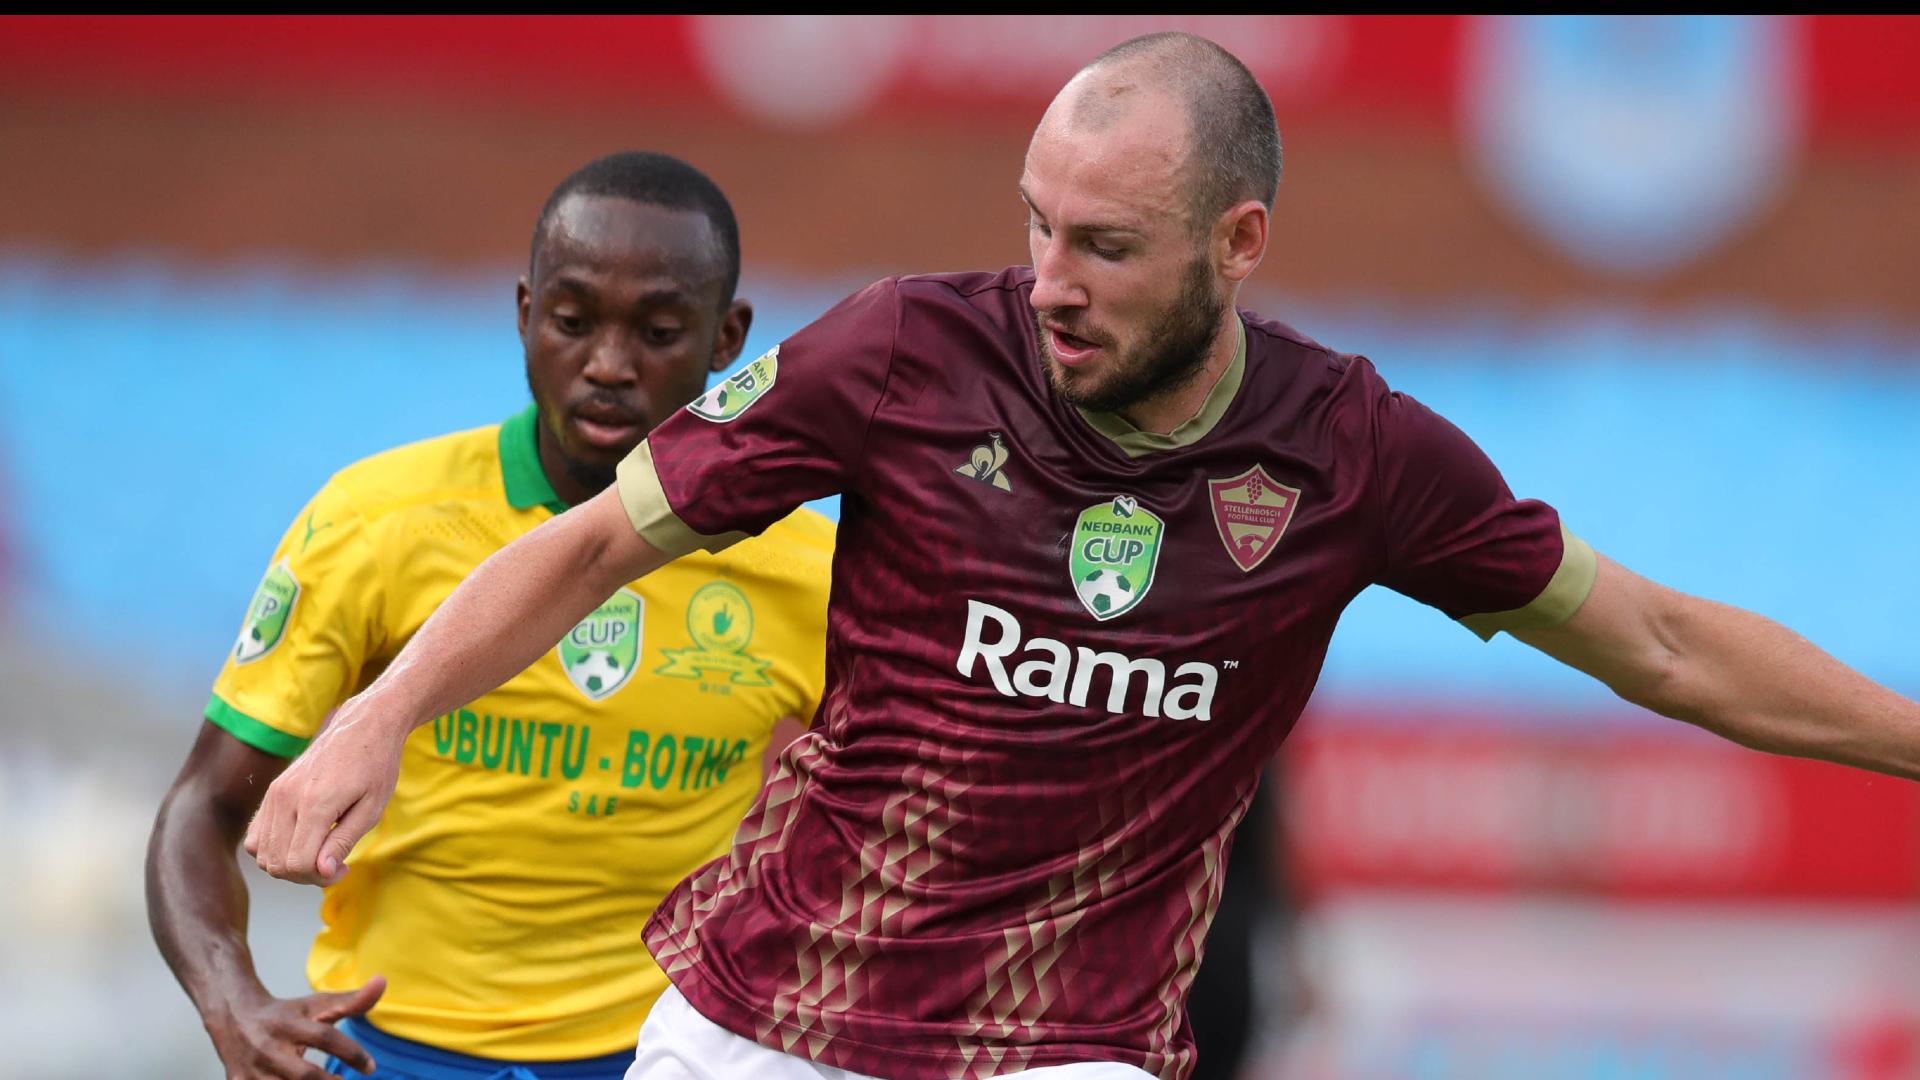 Mamelodi Sundowns 3-2 Stellenbosch FC (AET): Shalulile fires Masandawana into Nedbank Cup Last 16